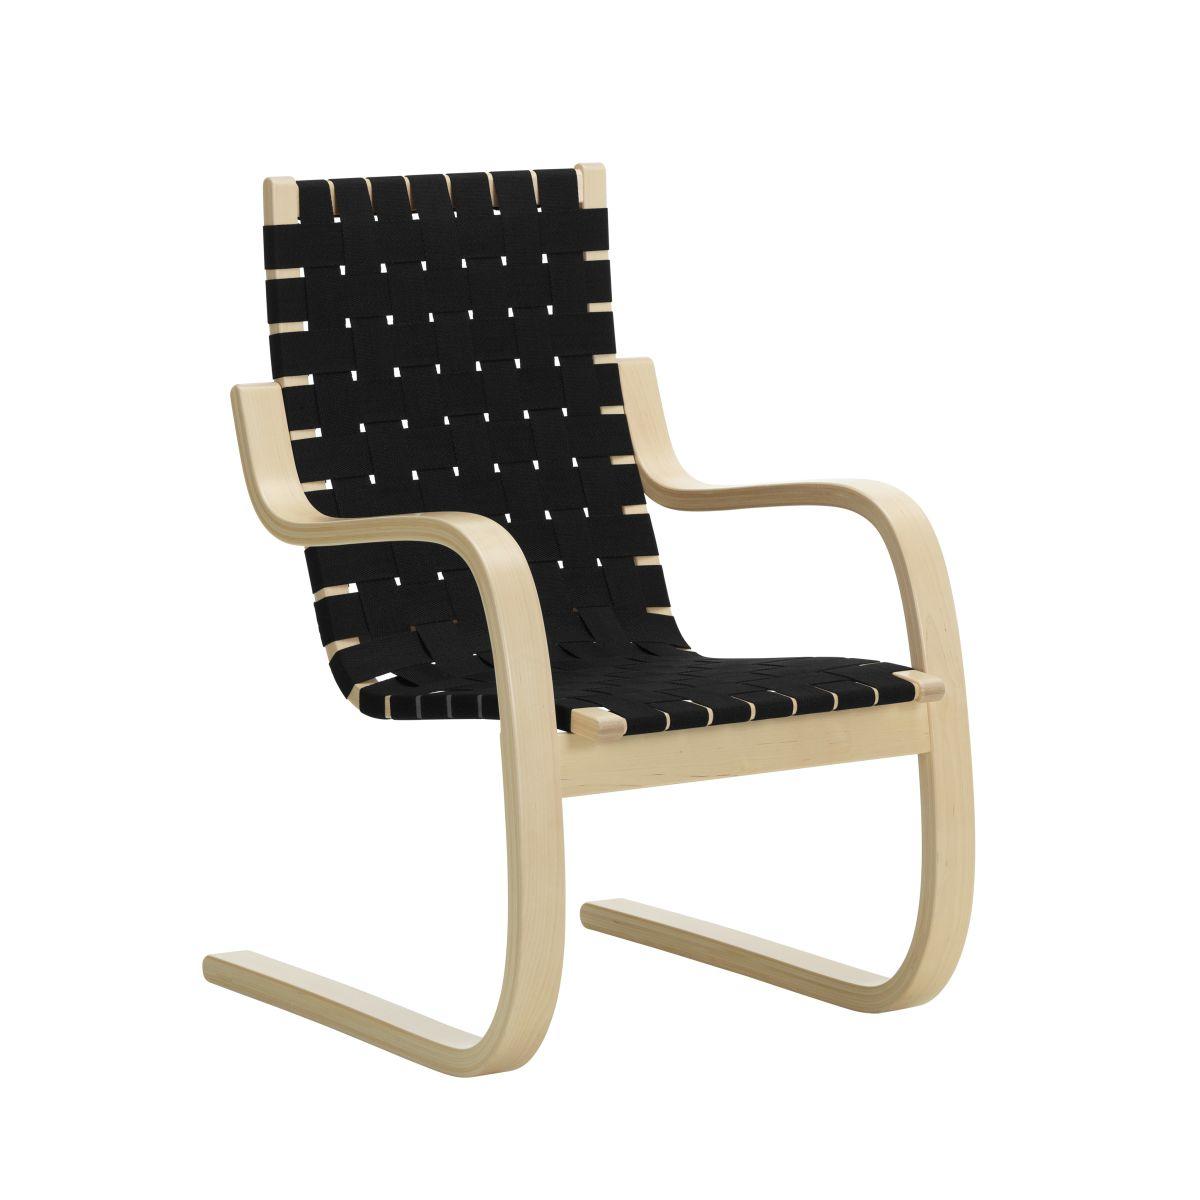 Armchair-406-natural-black-black-webbing_F-2897102